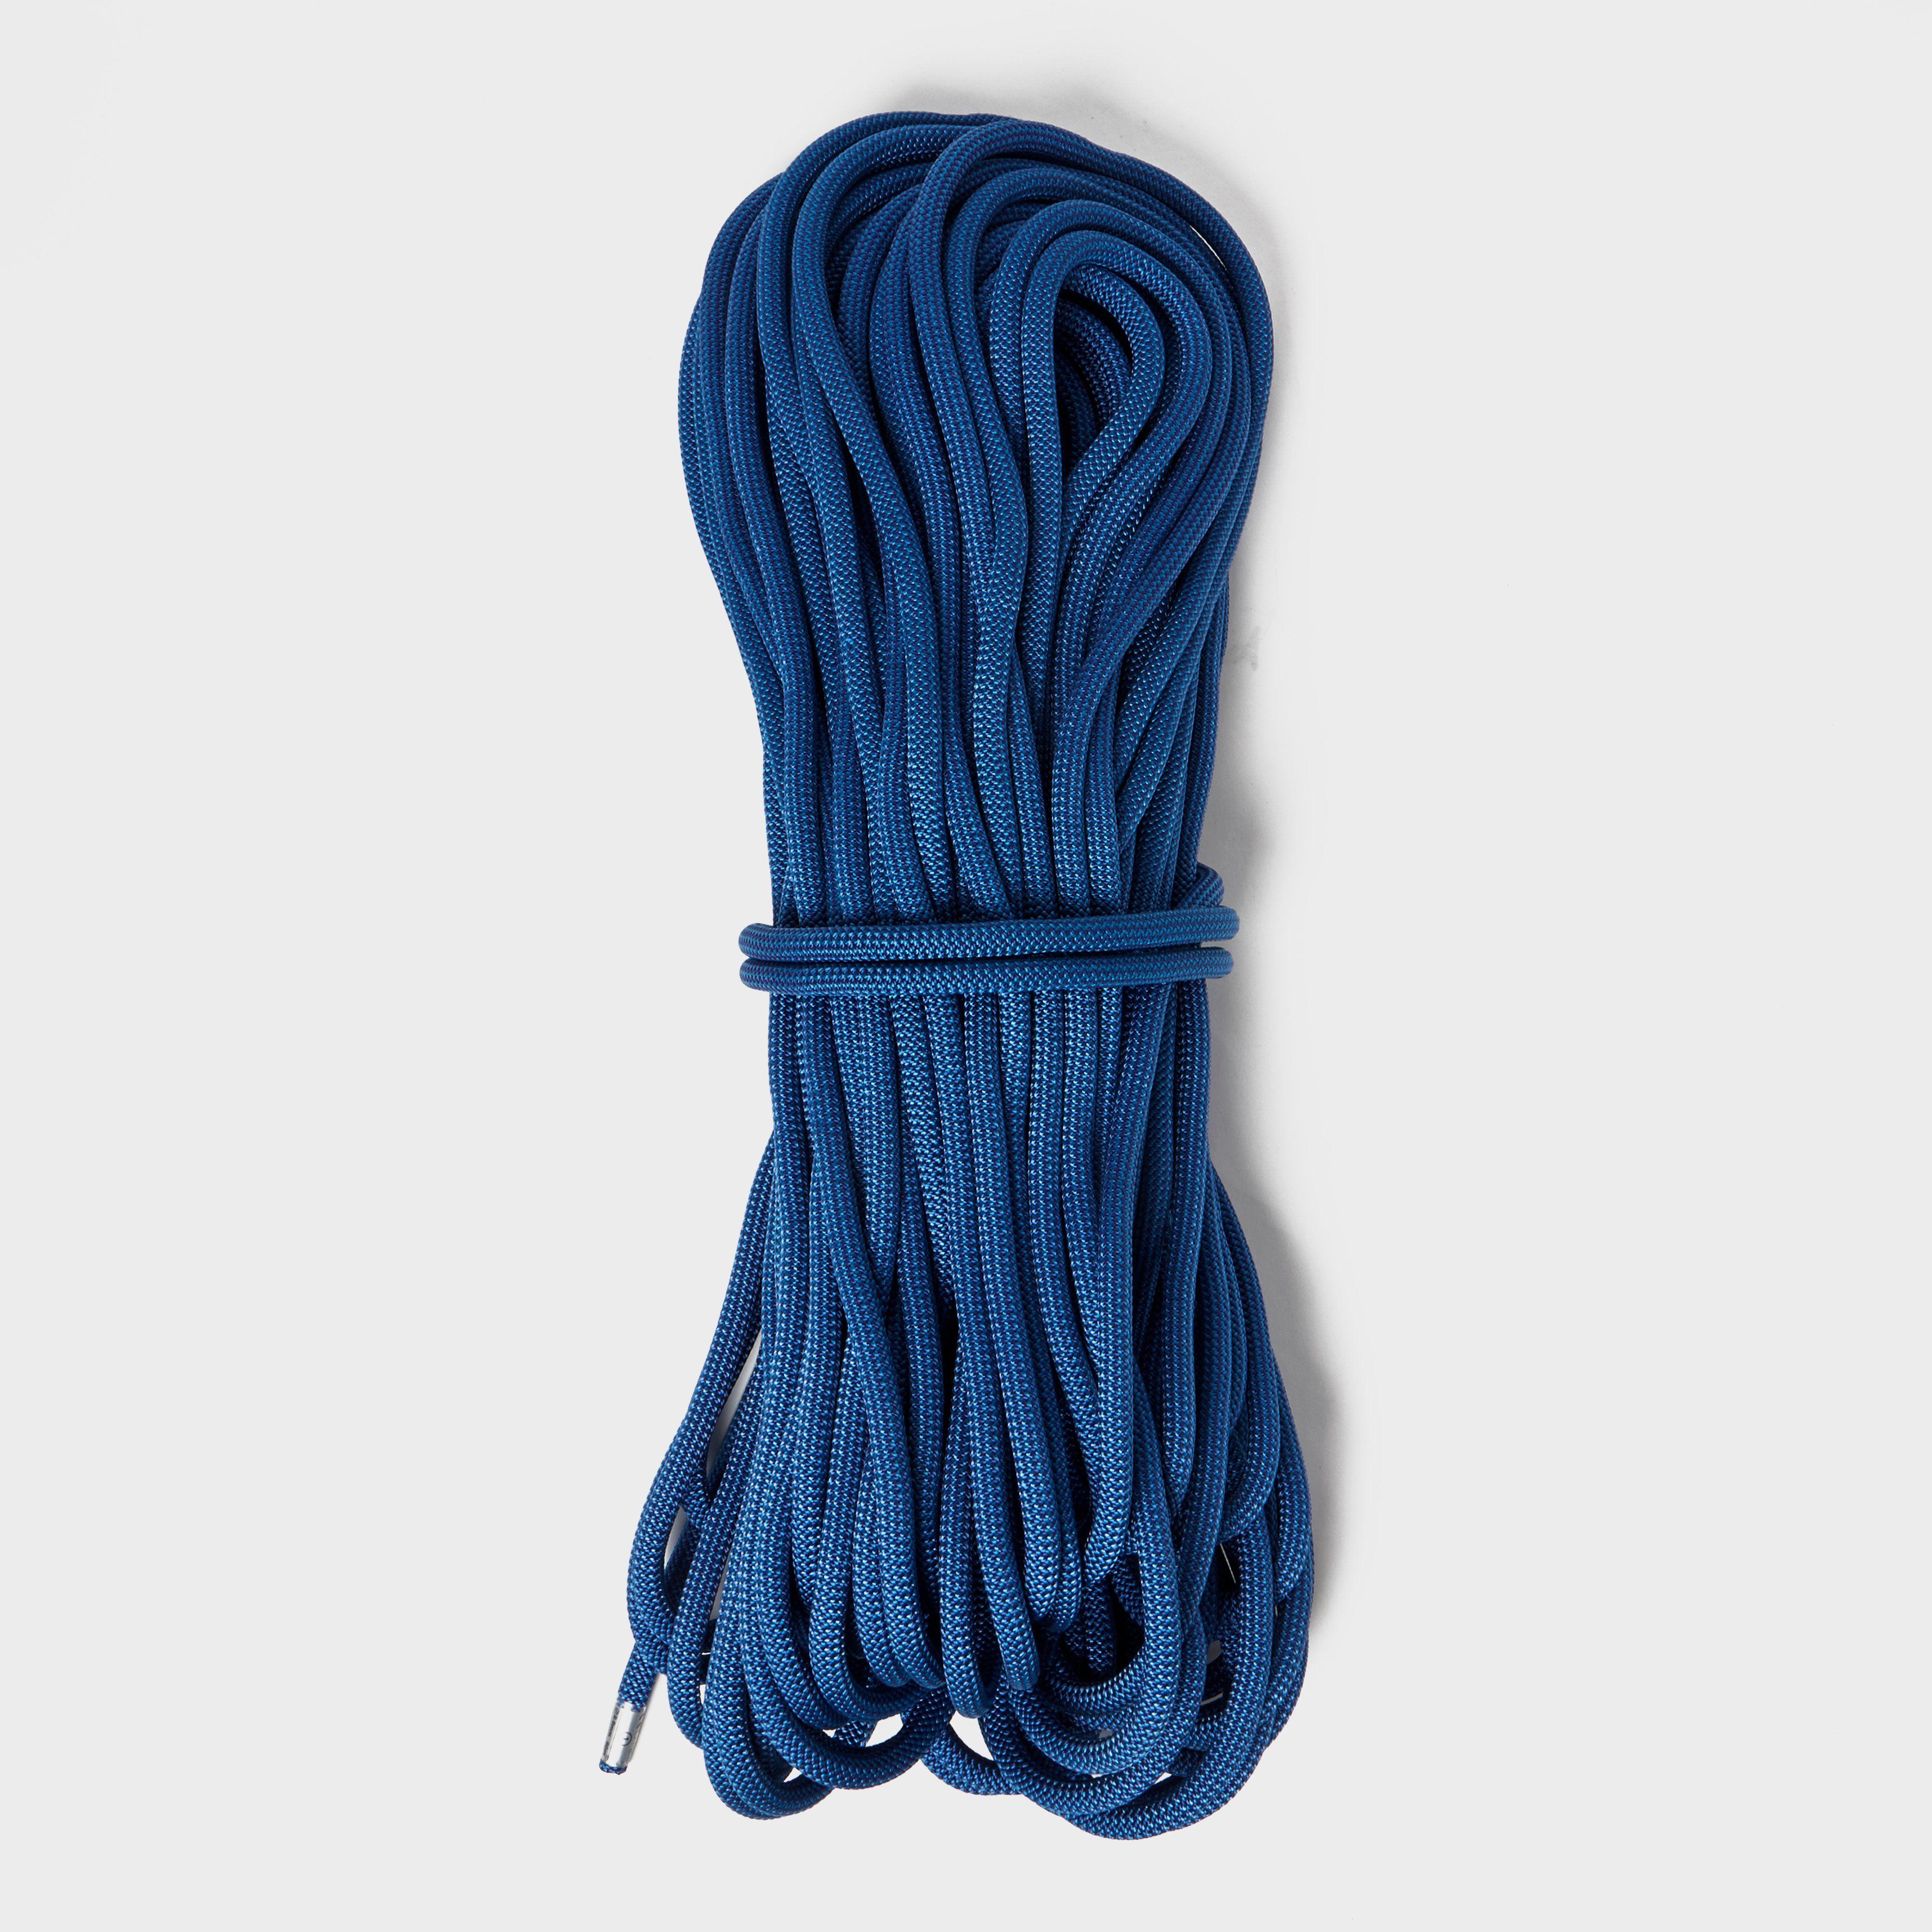 PETZL Contact® 9.8mm Climbing Rope 60m